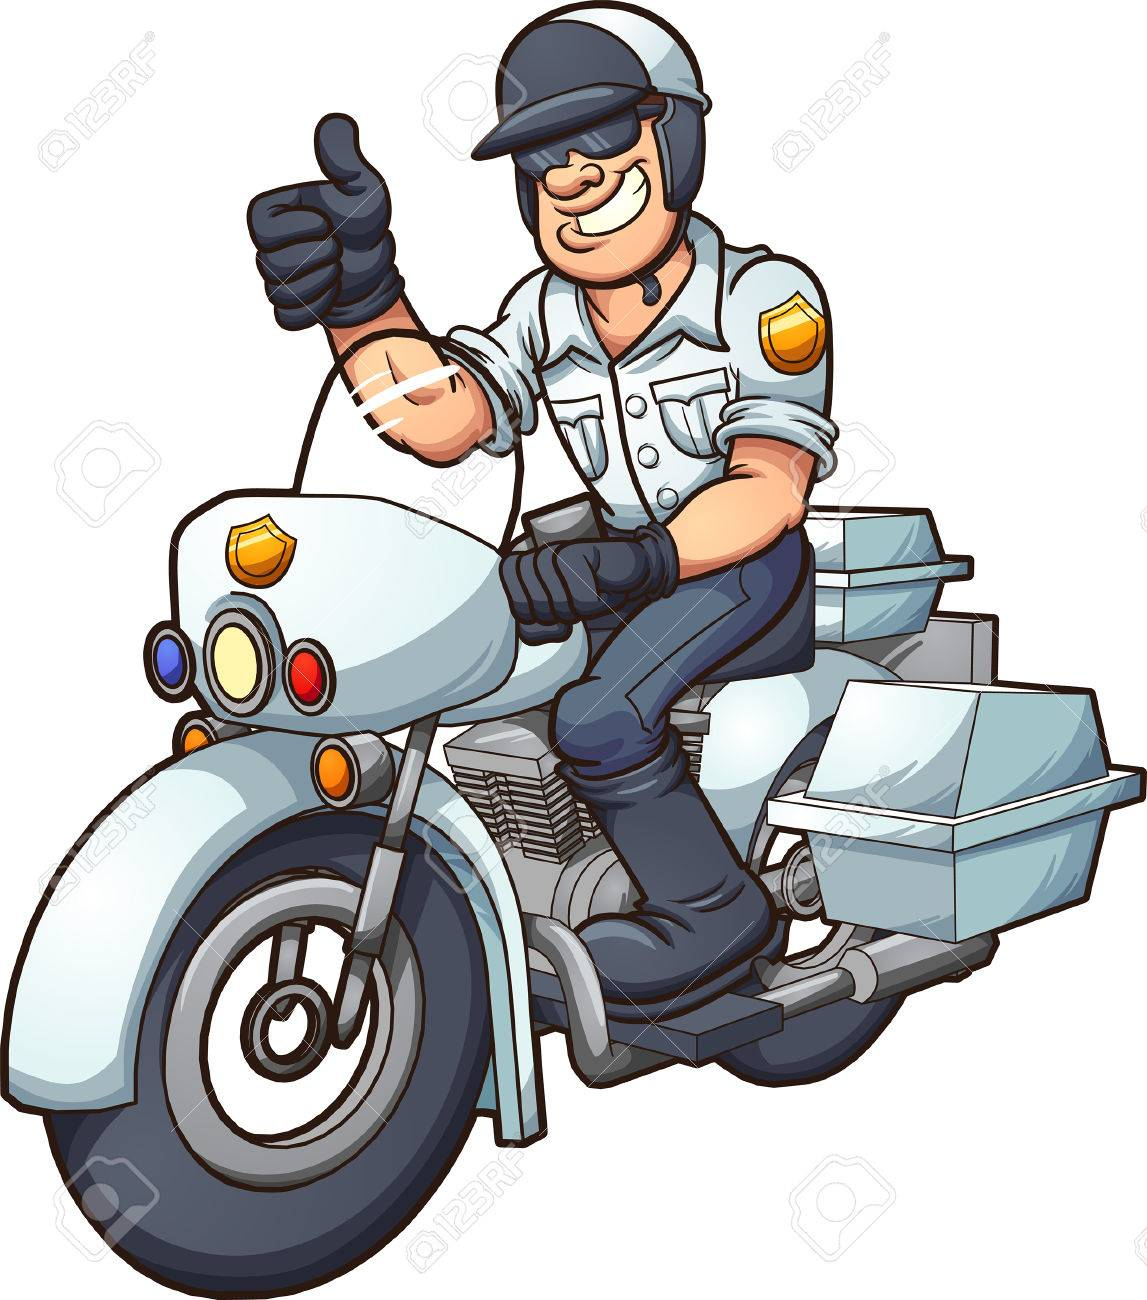 Cartoon Motorcycle Cop Vector Clip Art Illustration With Simple